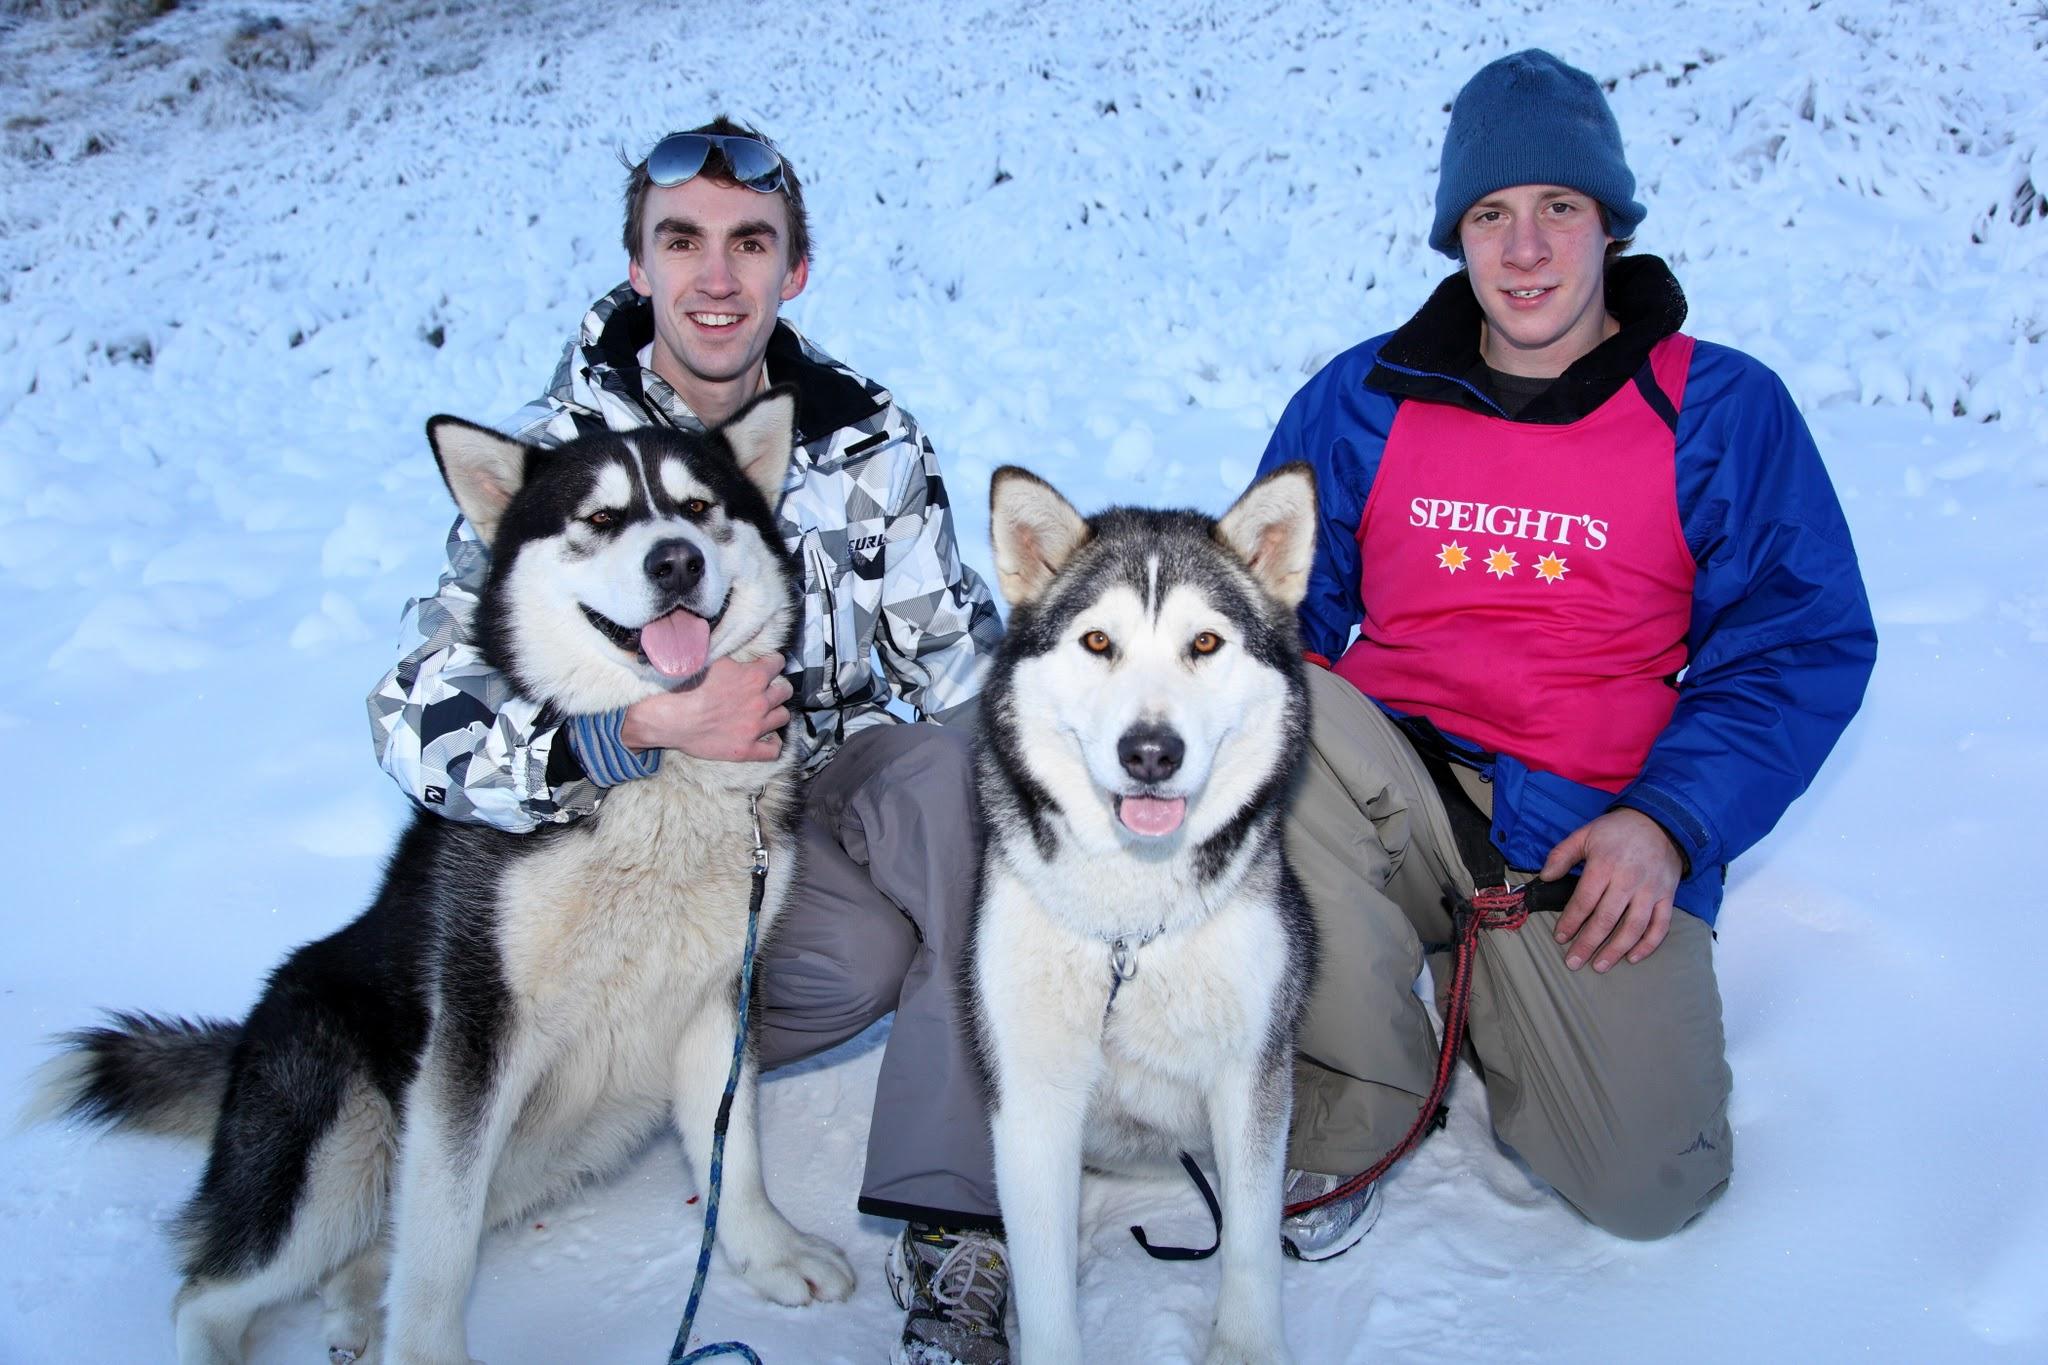 Photo: Speight's Dog Derby on Coronet Peak